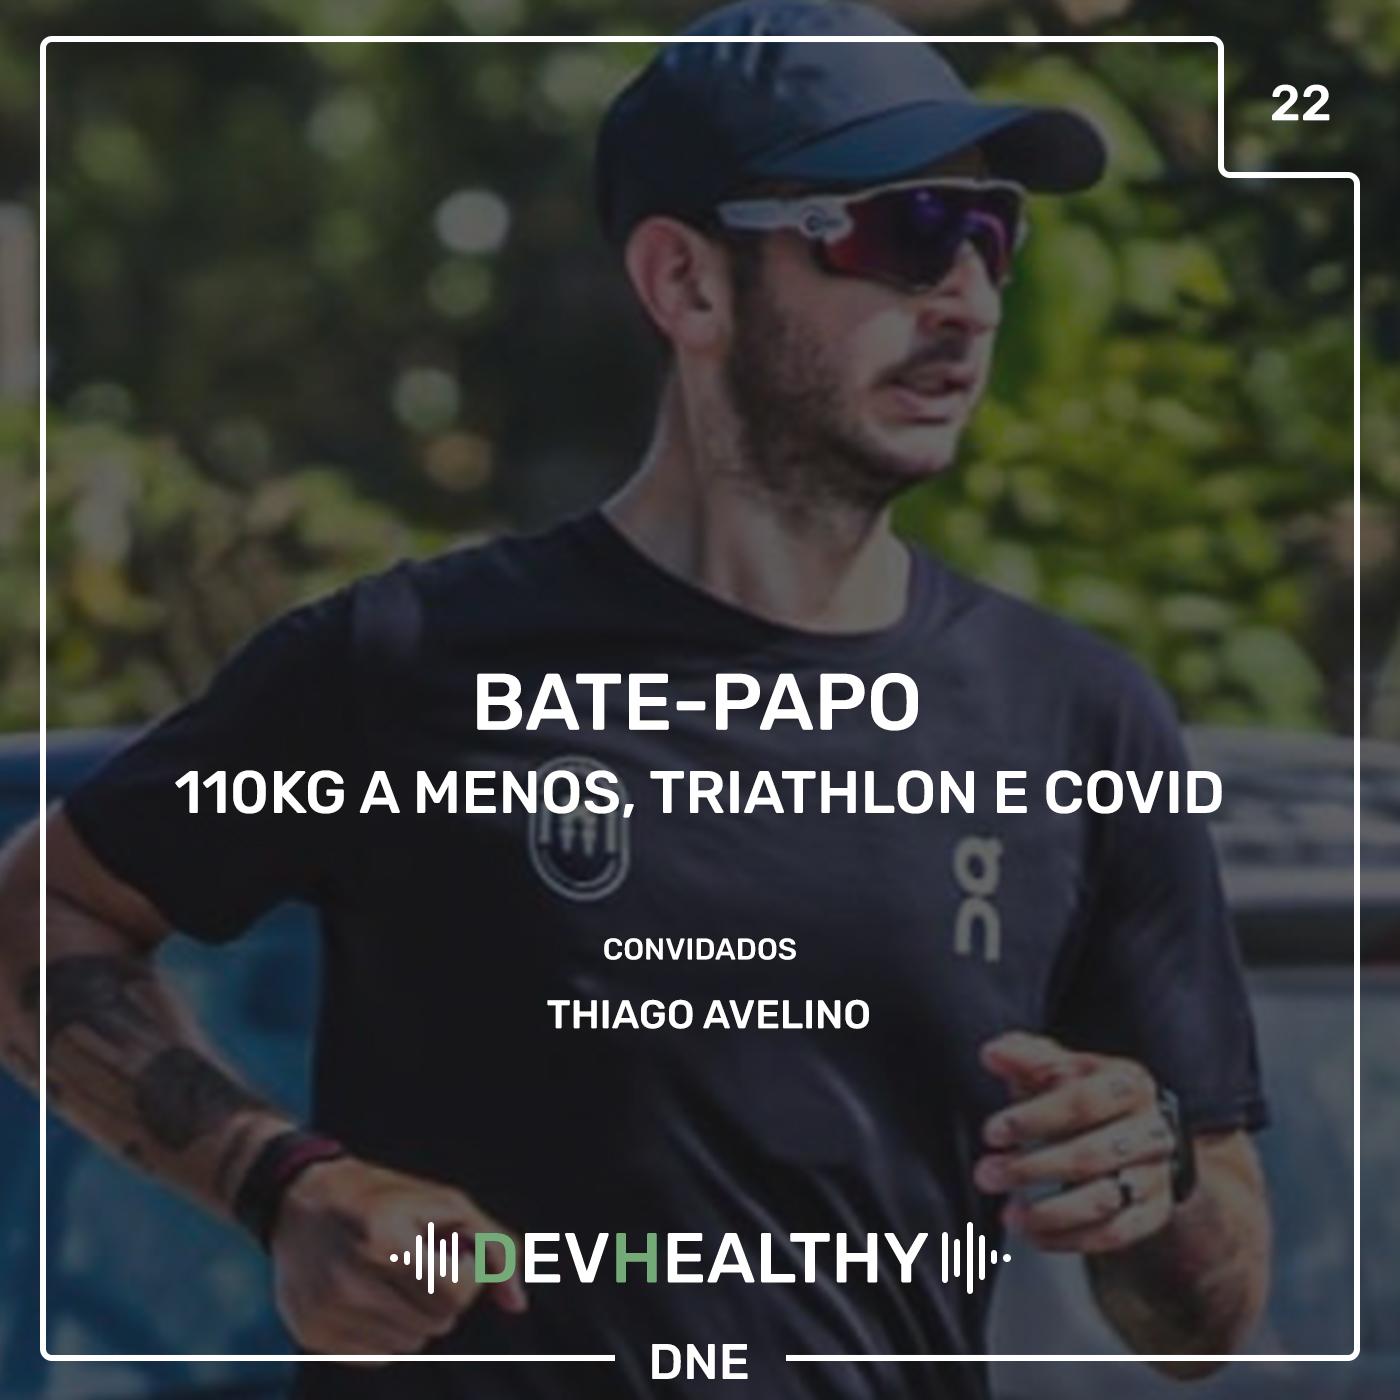 DevHealthy #22 - Bate-papo: Thiago Avelino - 110kg a menos, Triathlon e COVID